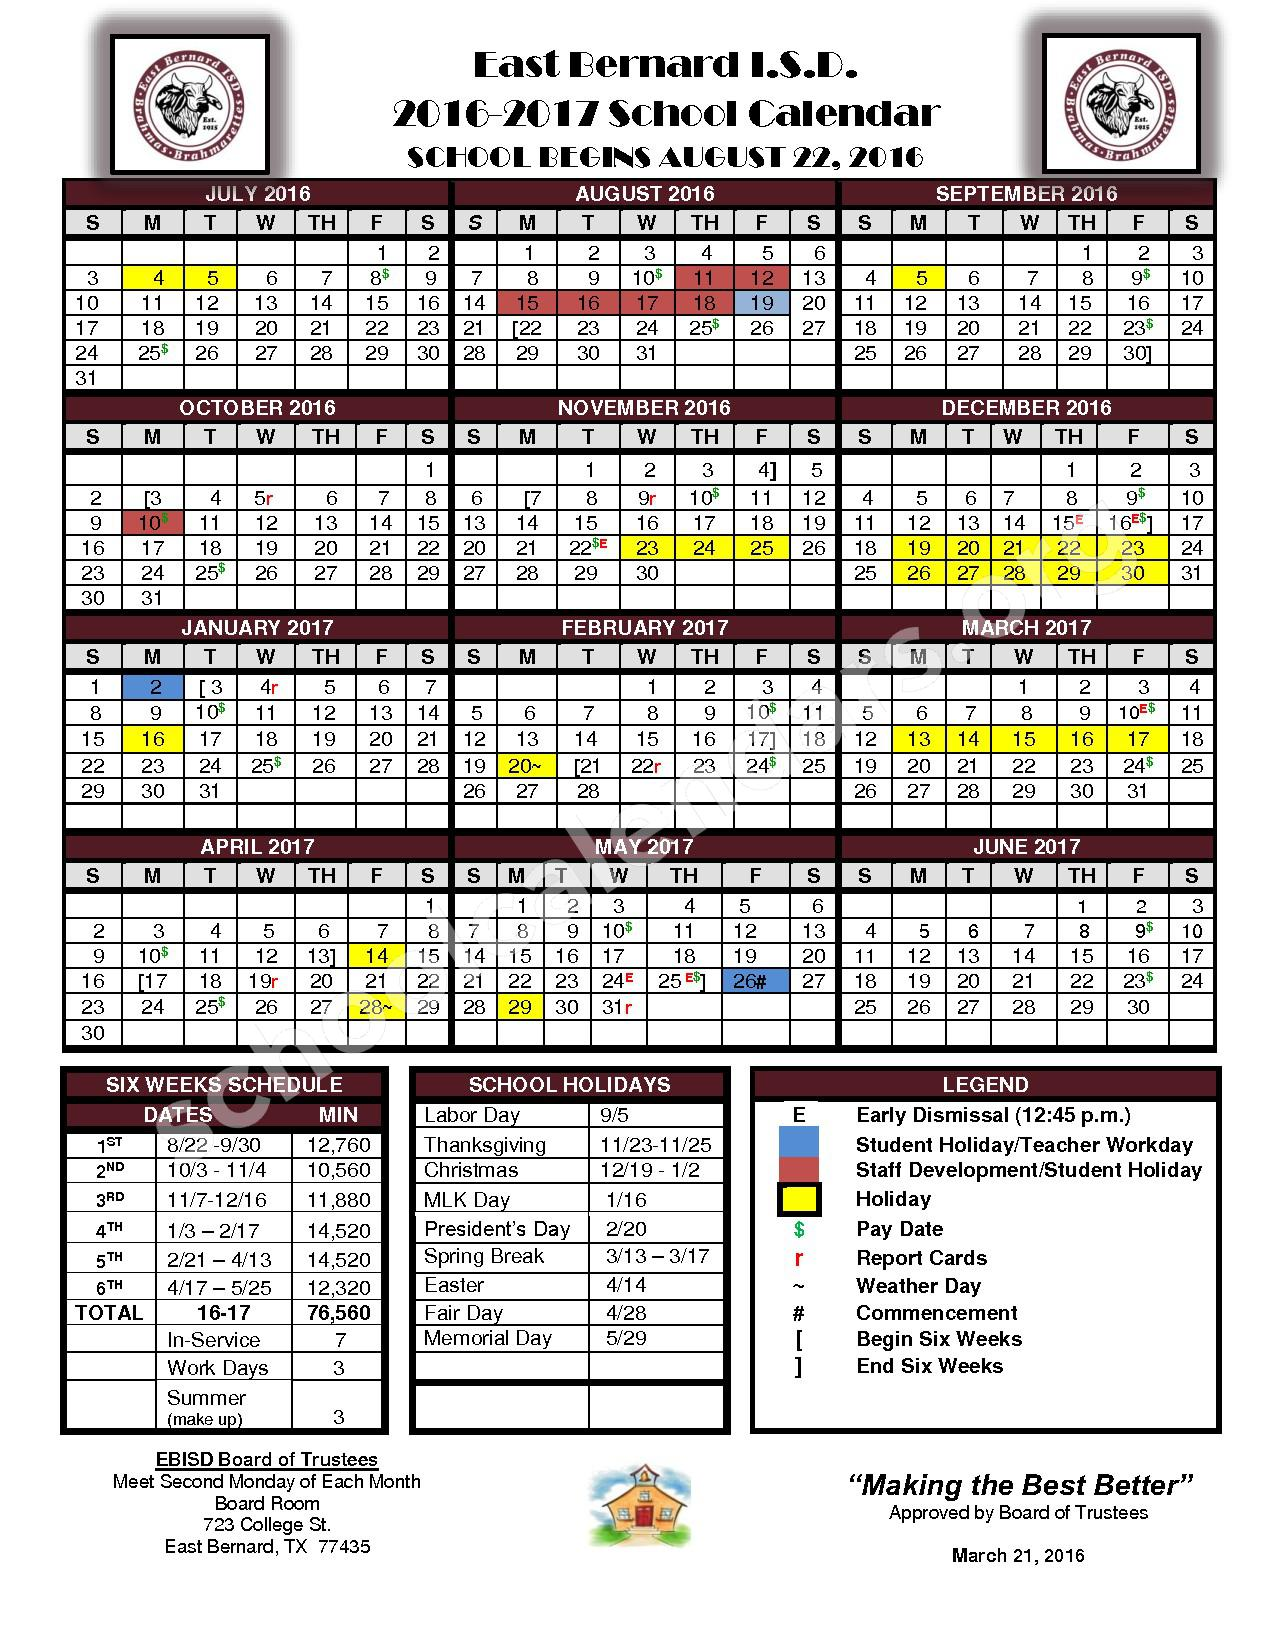 2016 - 2017 School Calendar – East Bernard Independent School District – page 1